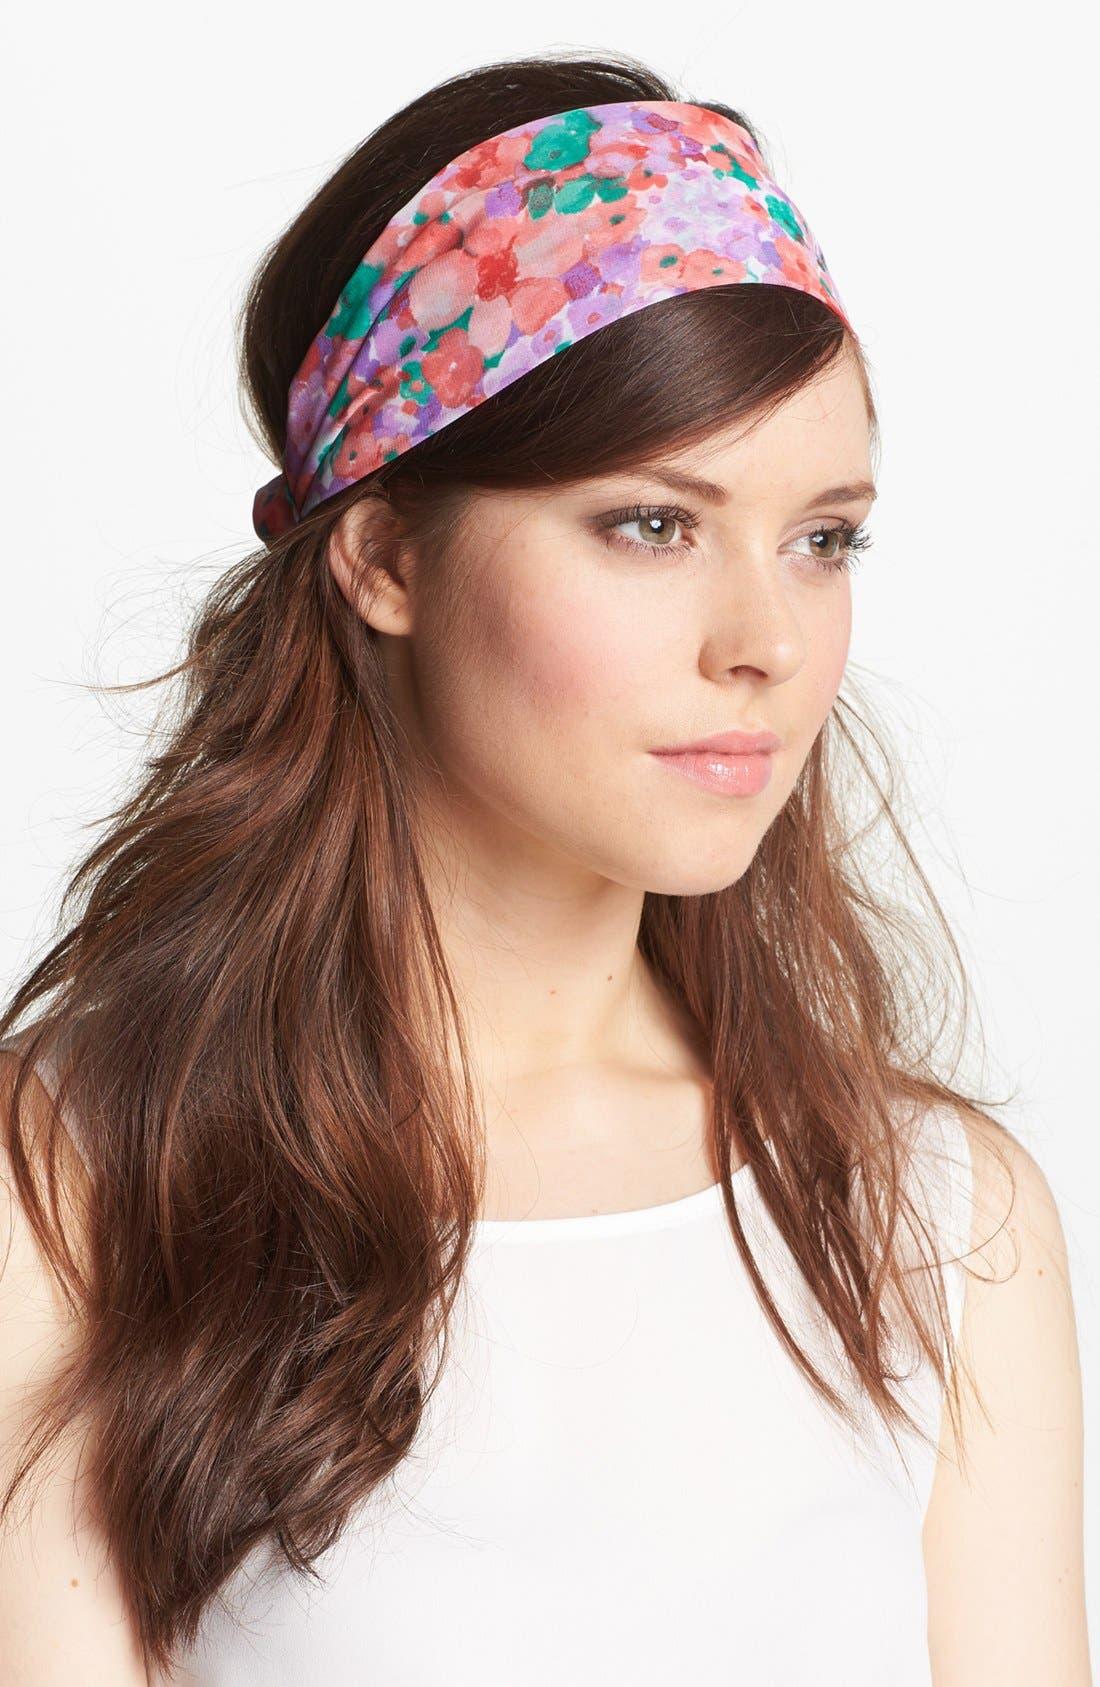 Alternate Image 1 Selected - Tasha 'Frolicking Floral' Head Wrap